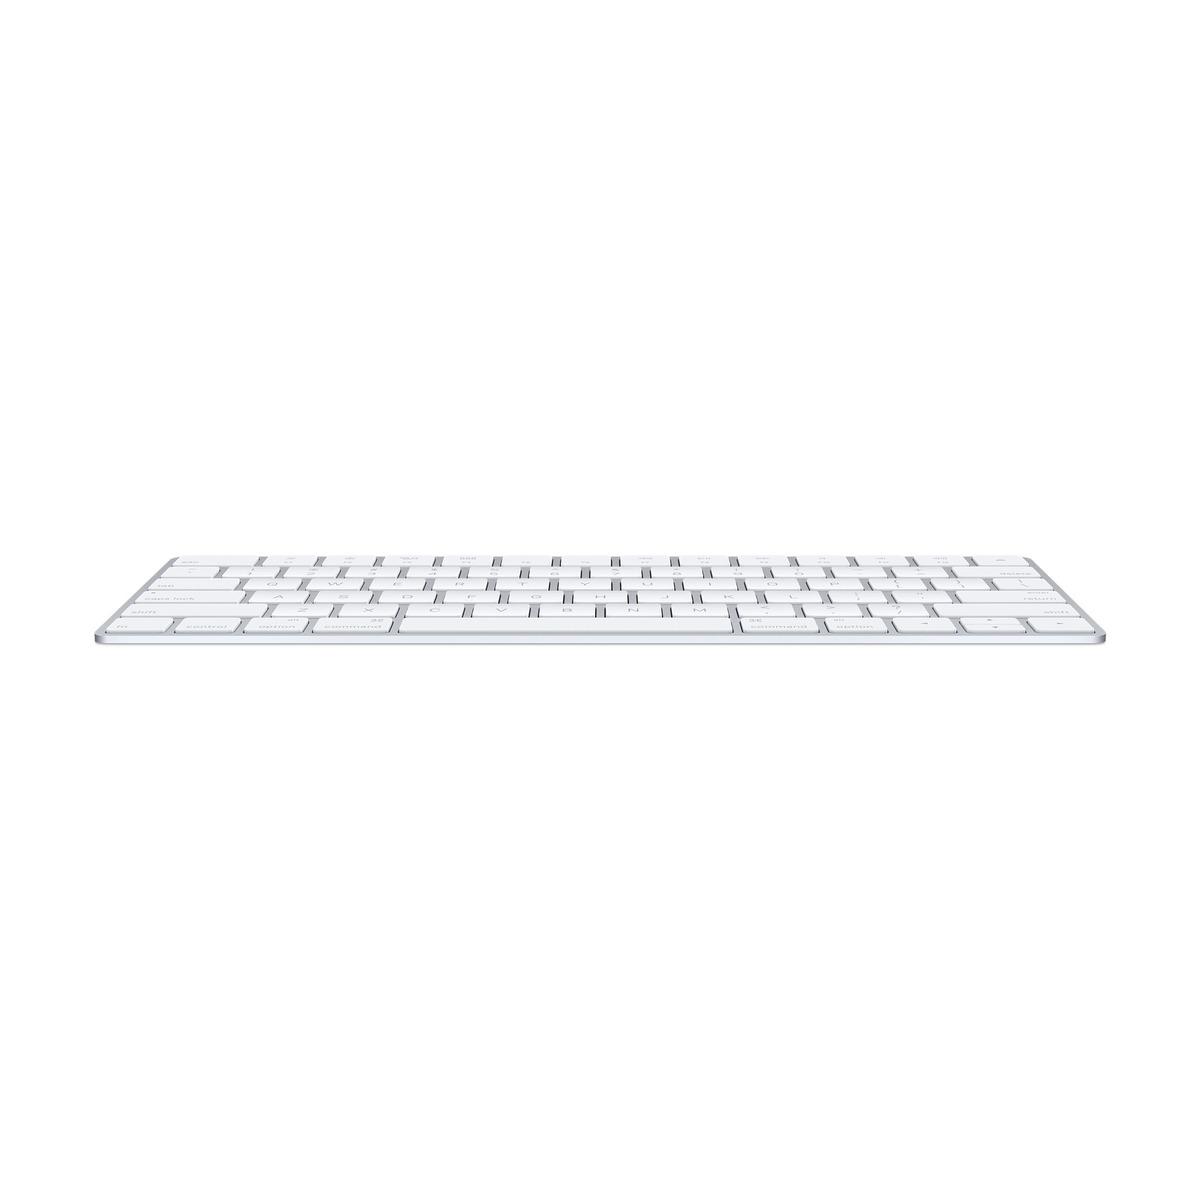 Apple Wireless Keyboard White Tastatur Dansk Grå | Billig